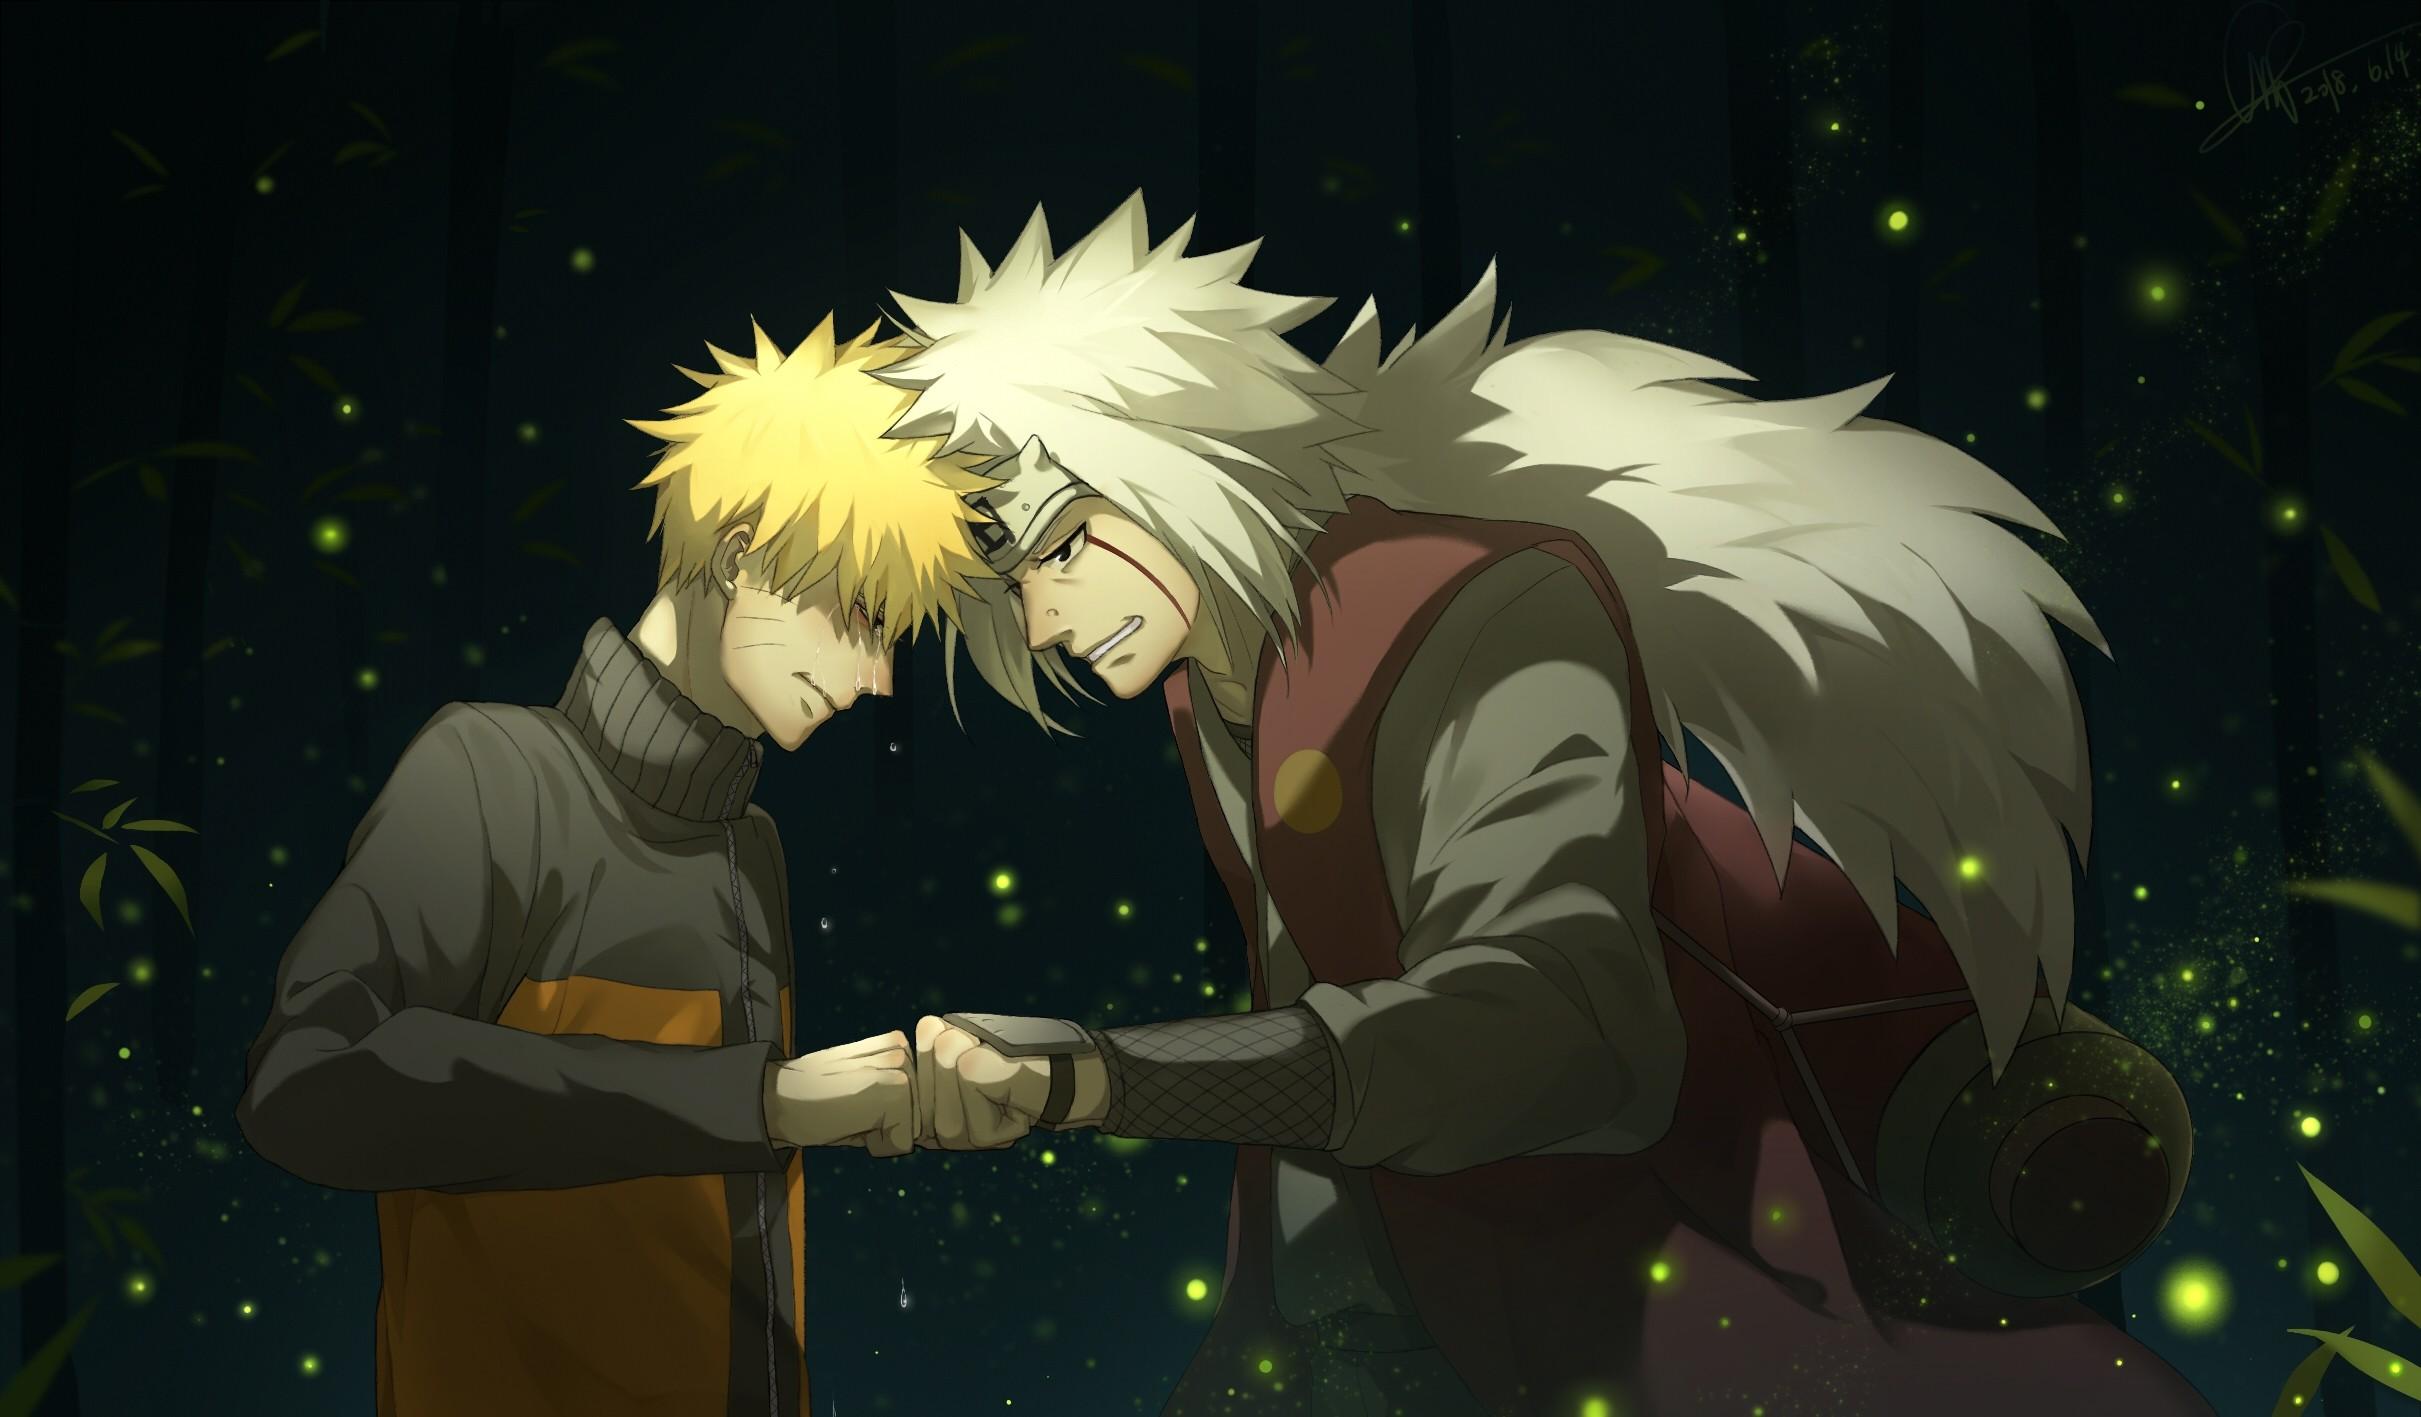 Res: 2421x1417, Naruto/Jiraiya HD Wallpaper | Hintergrund |  | ID:941171 -  Wallpaper Abyss